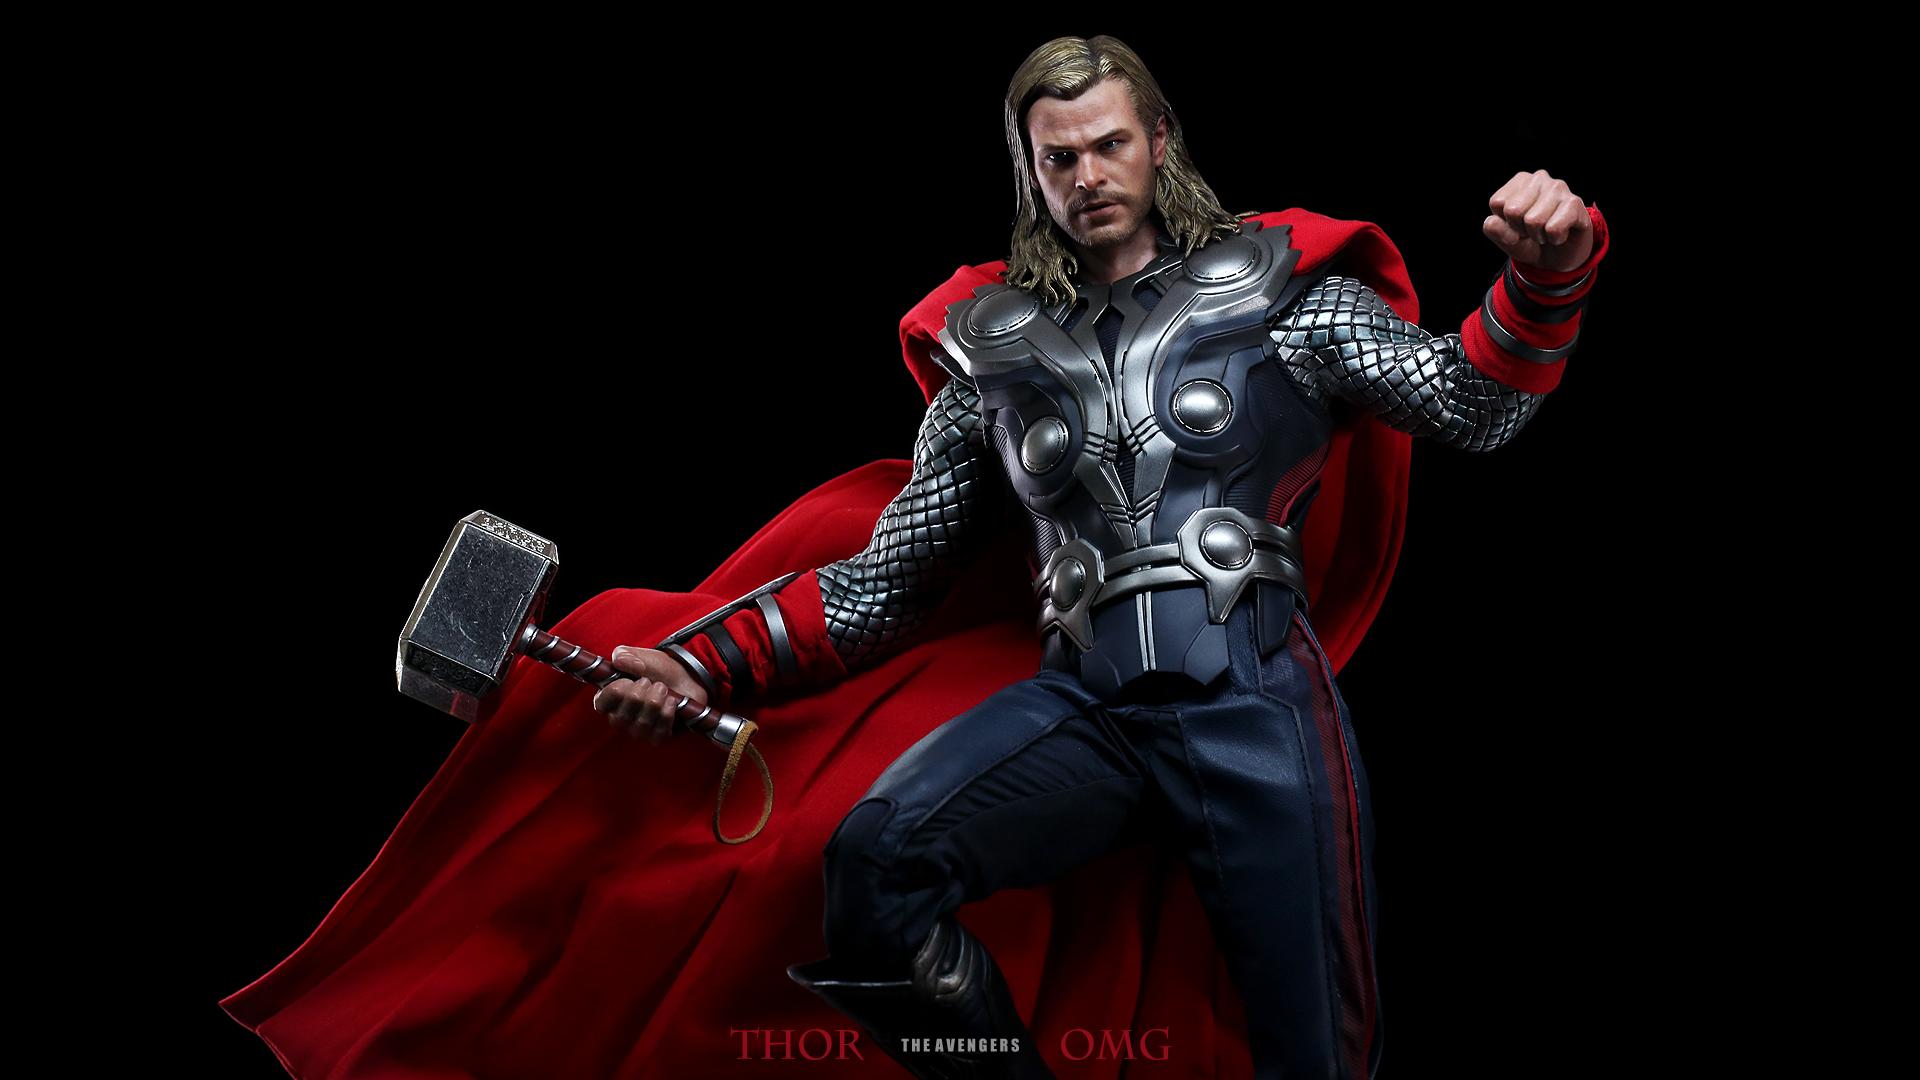 Heimdal Hd Wallpaper: Thor Movie Wallpaper